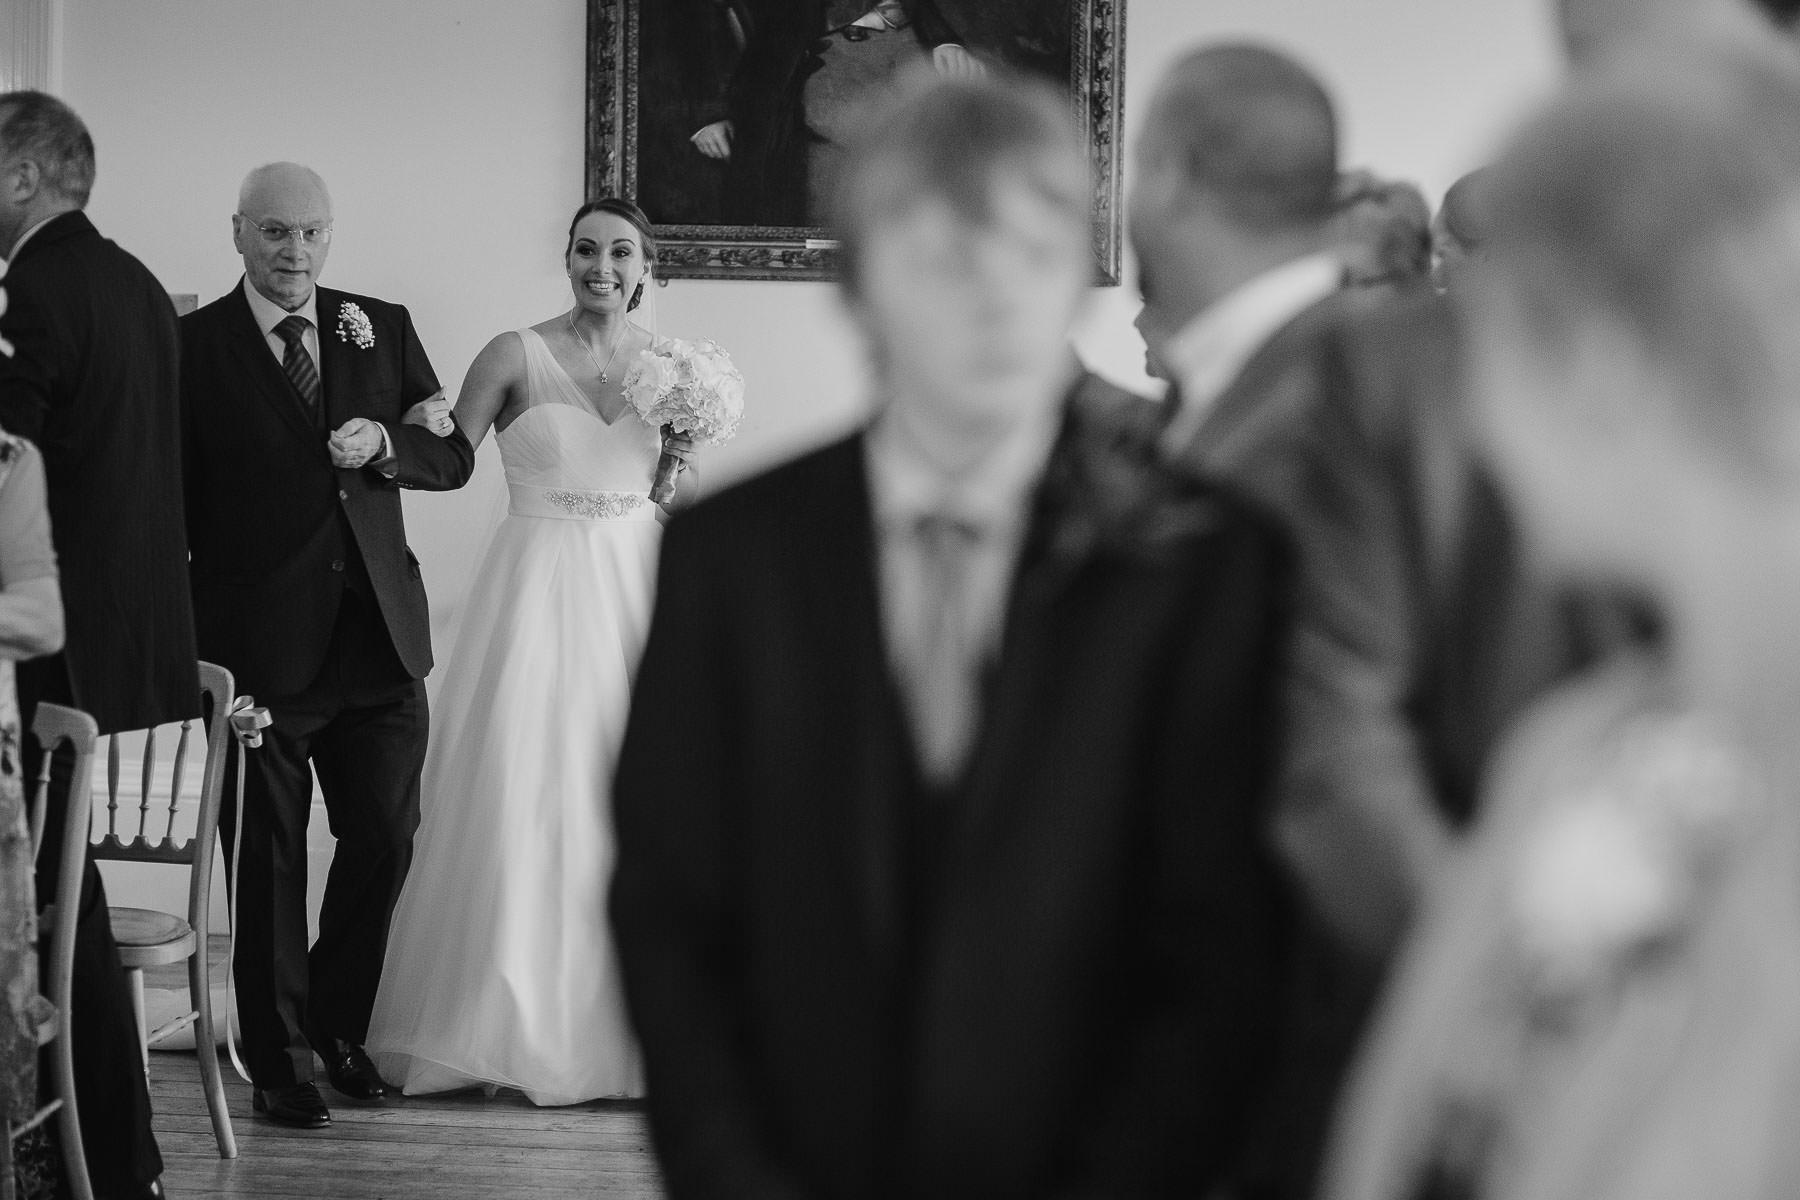 kew gardens wedding photography astra duncan13